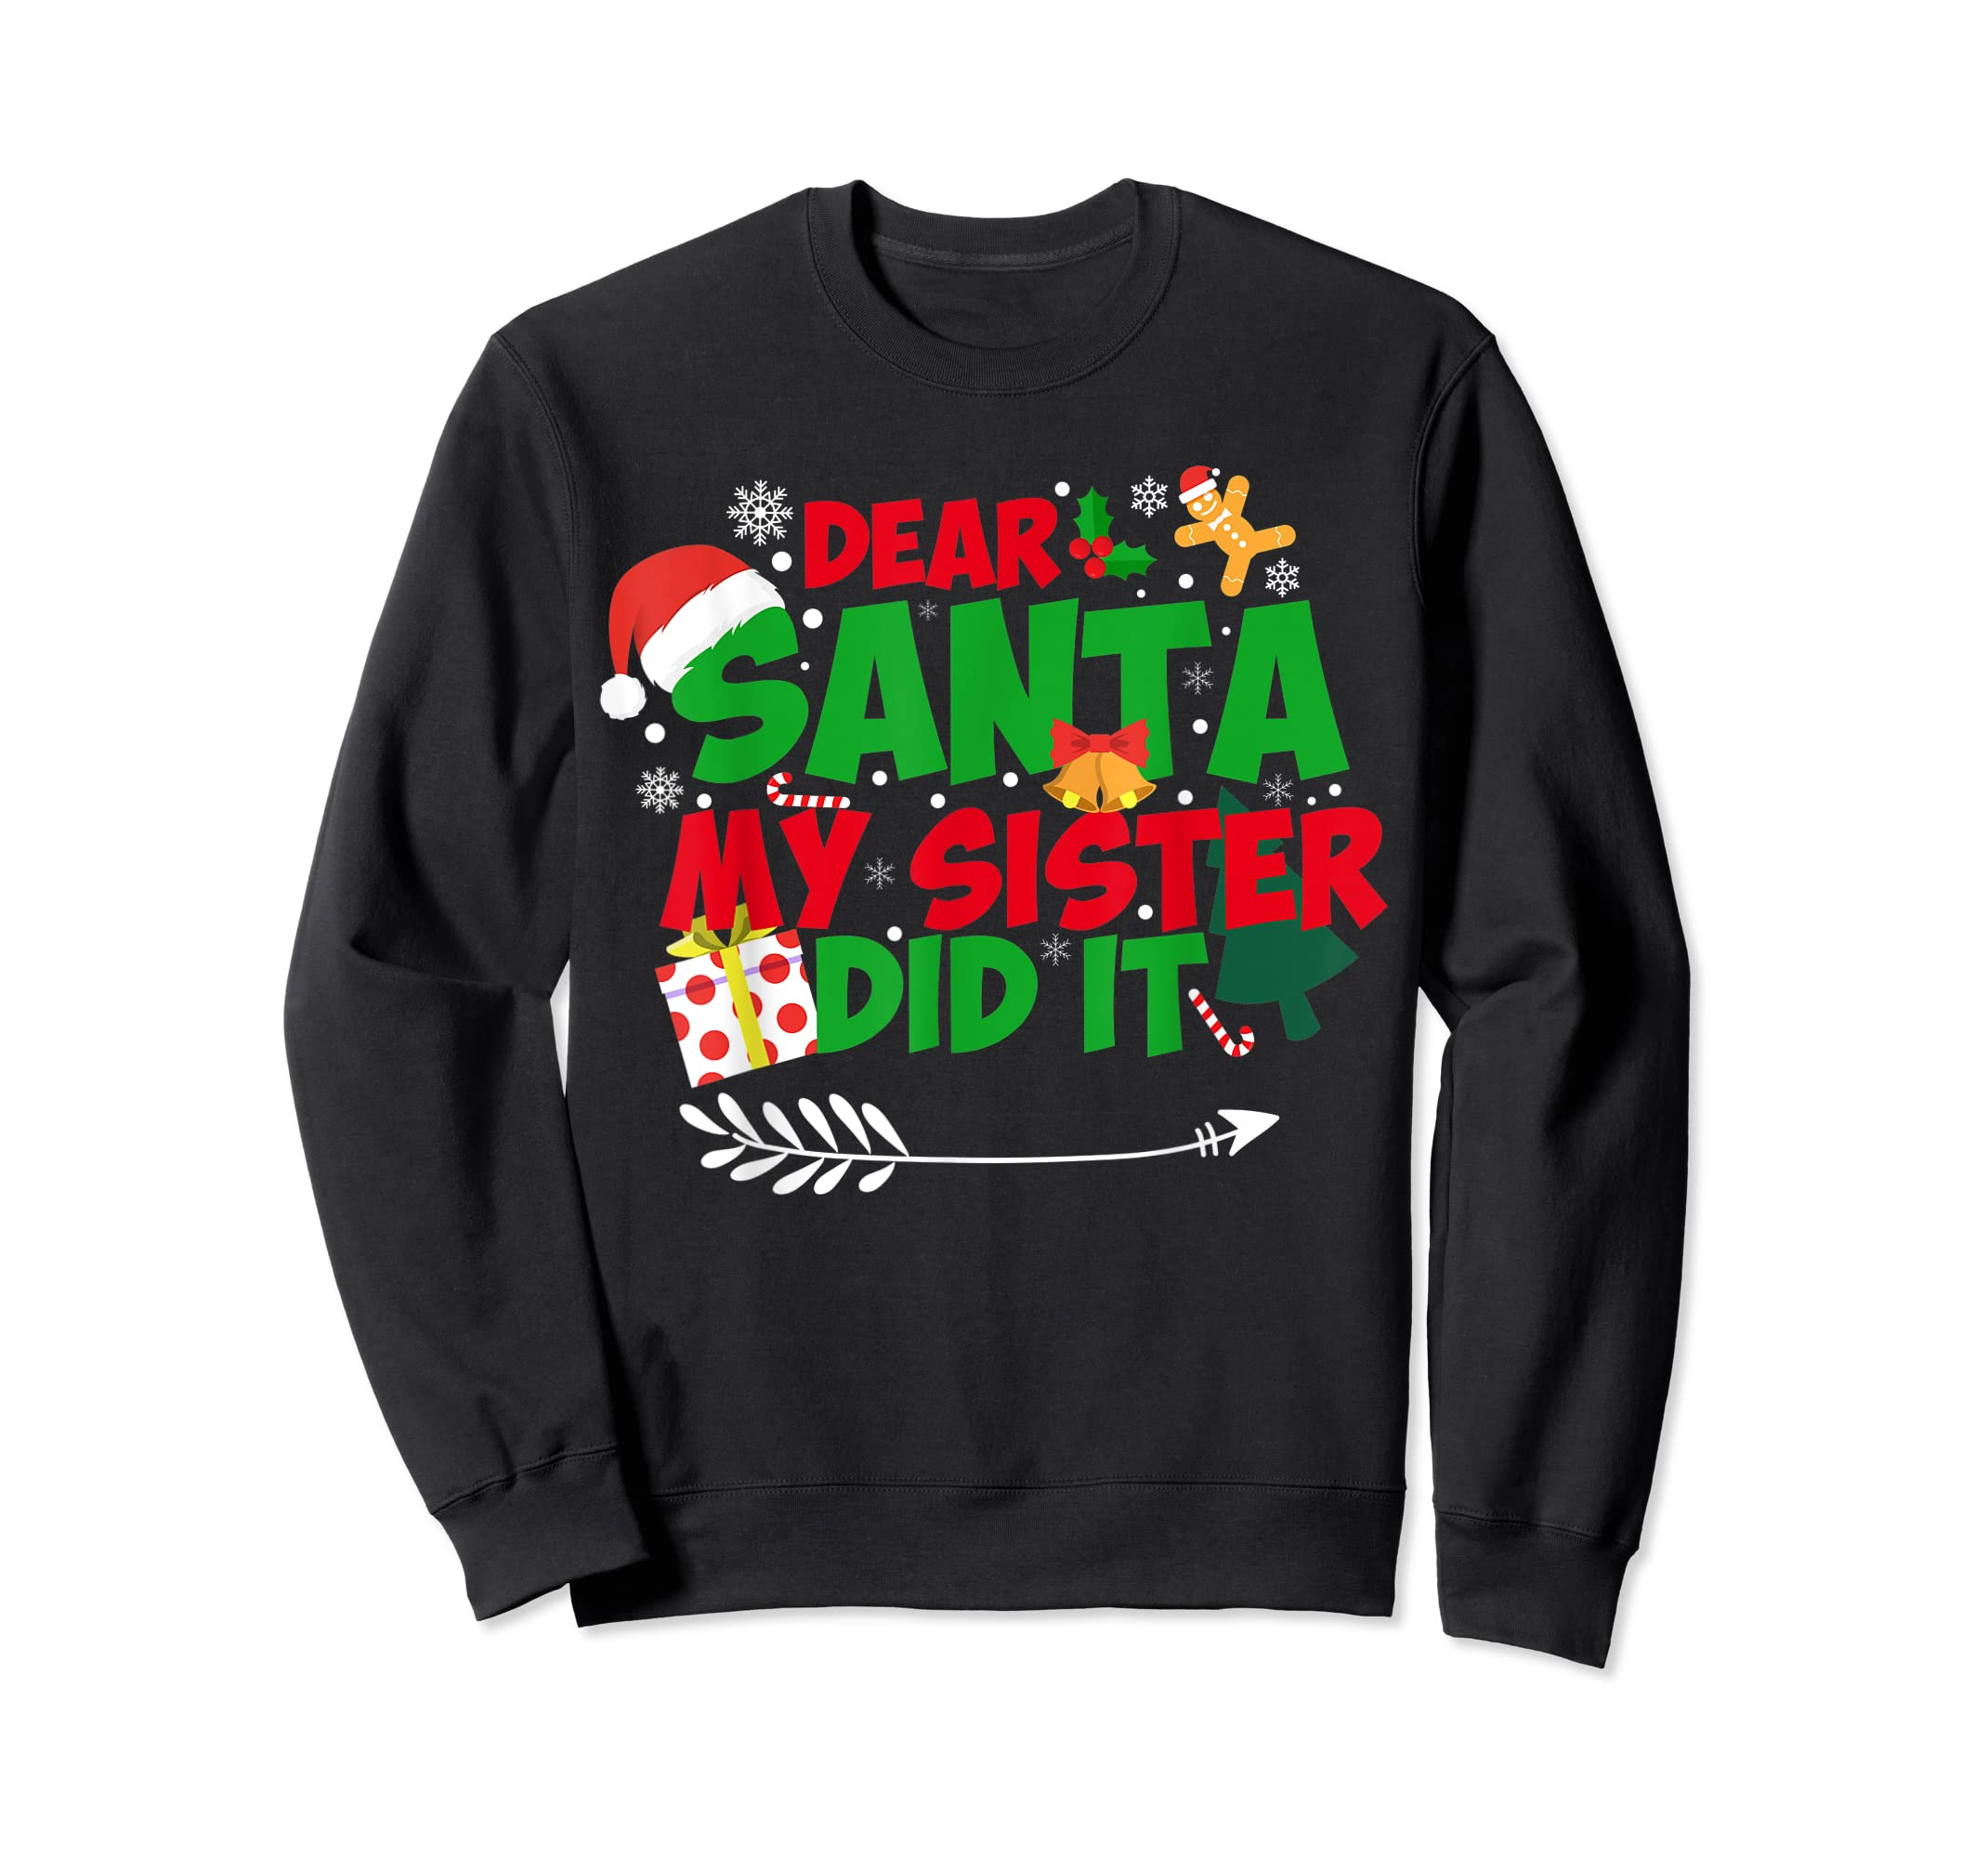 Family Christmas Gifts Dear santa my sister did it T-Shirt-Sweatshirt-Black